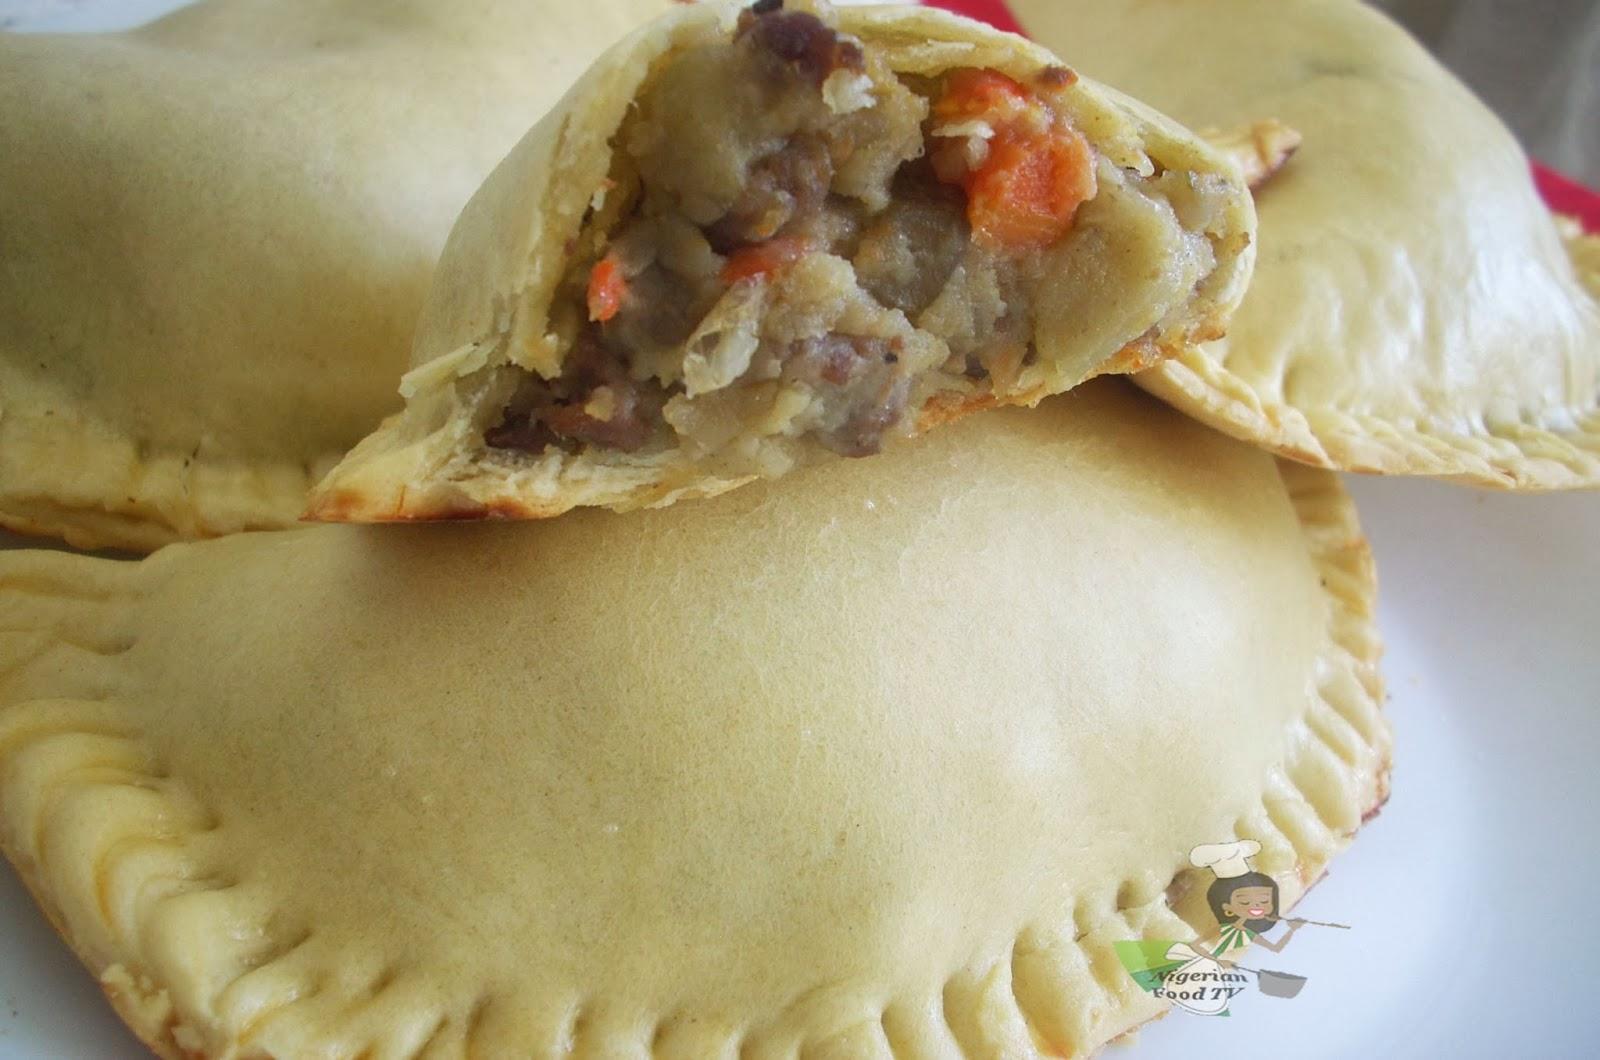 Nigerian Meat Pie recipe : How to Make Nigerian Meat Pie